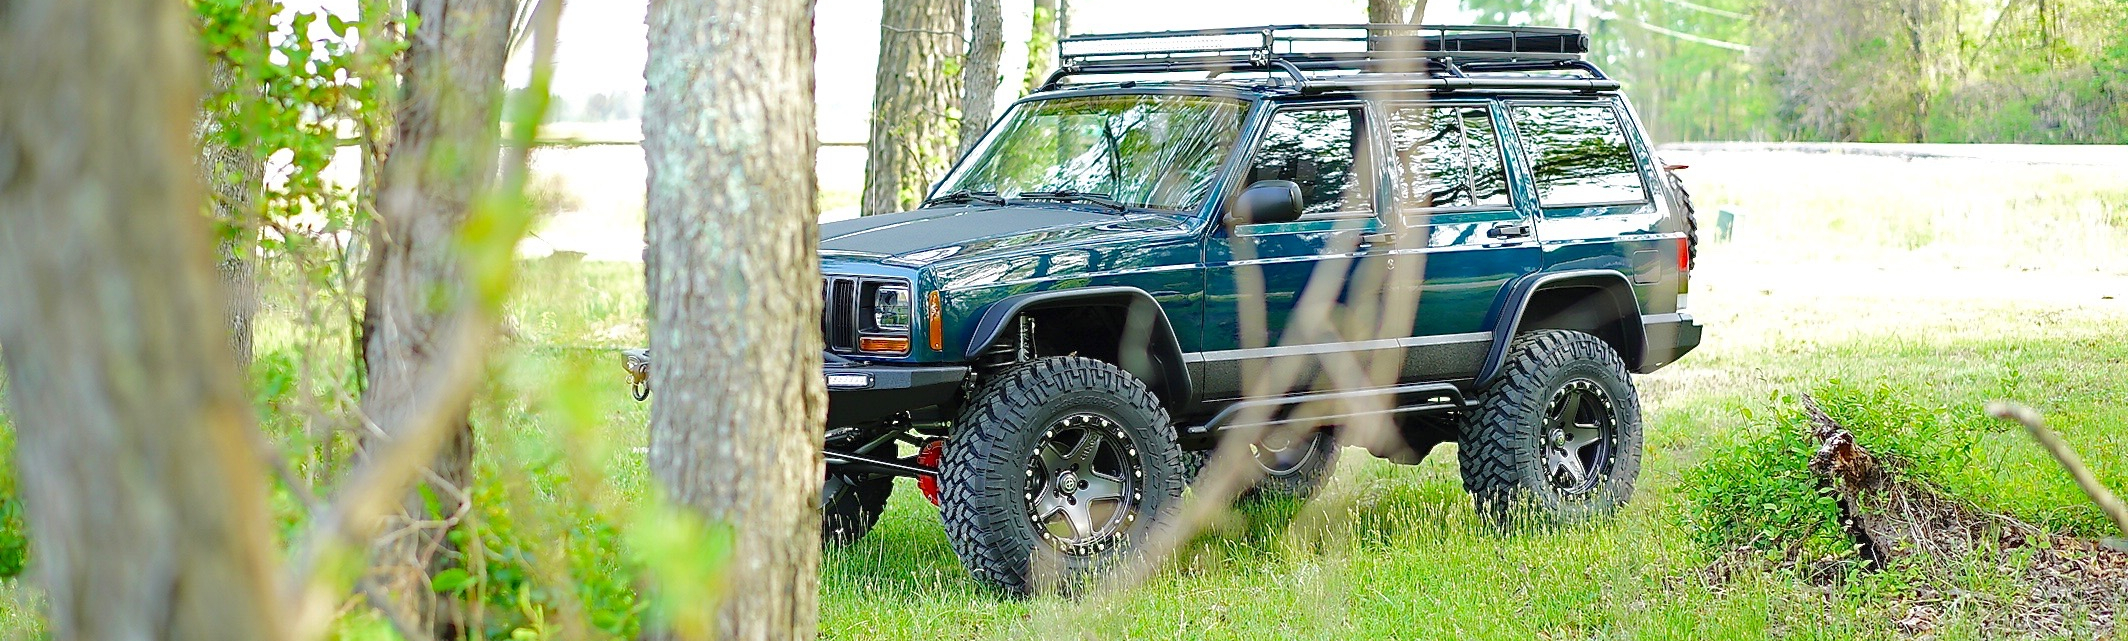 Built Cherokee Old Davis Autosports Jeep Brake Controller Custom 2000 Grand Lifted For Sale Xj Lift Kit